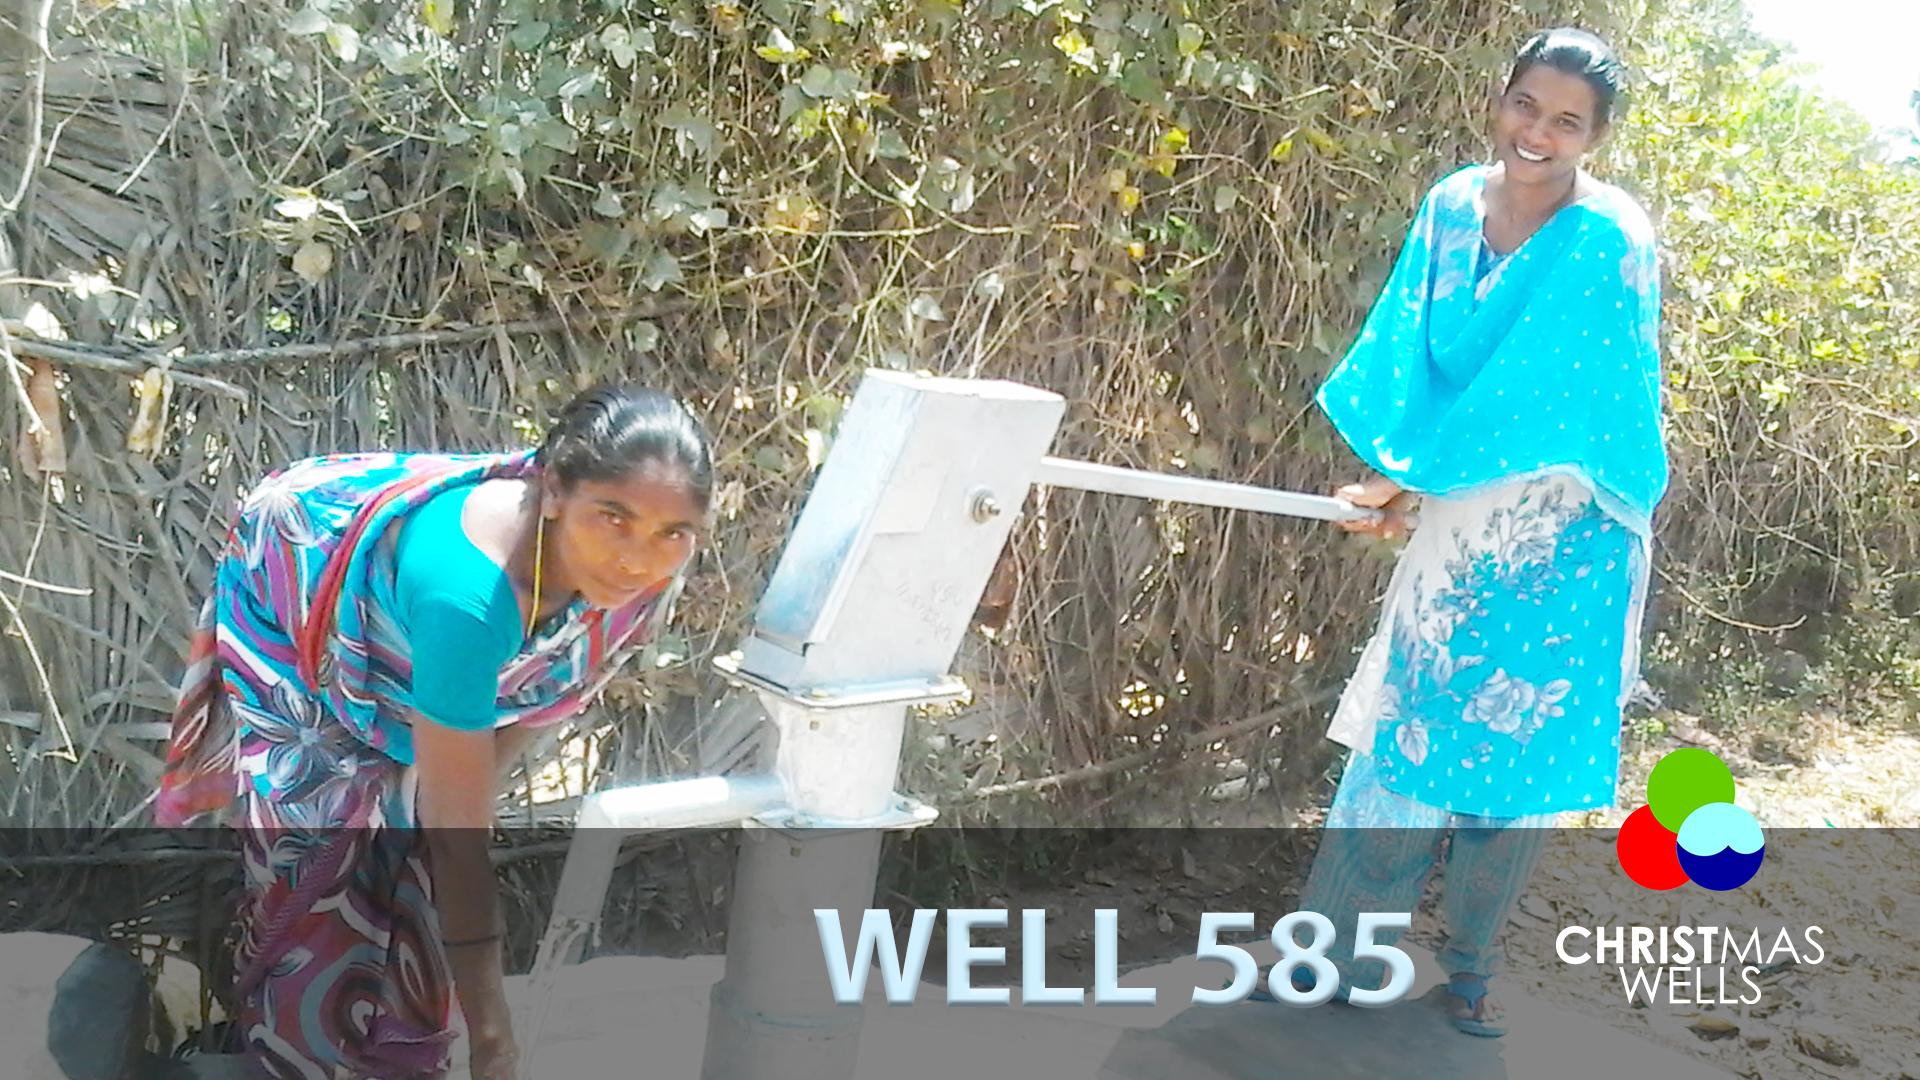 585_Wells-Set_2016-02_India_1920x1080.jpg